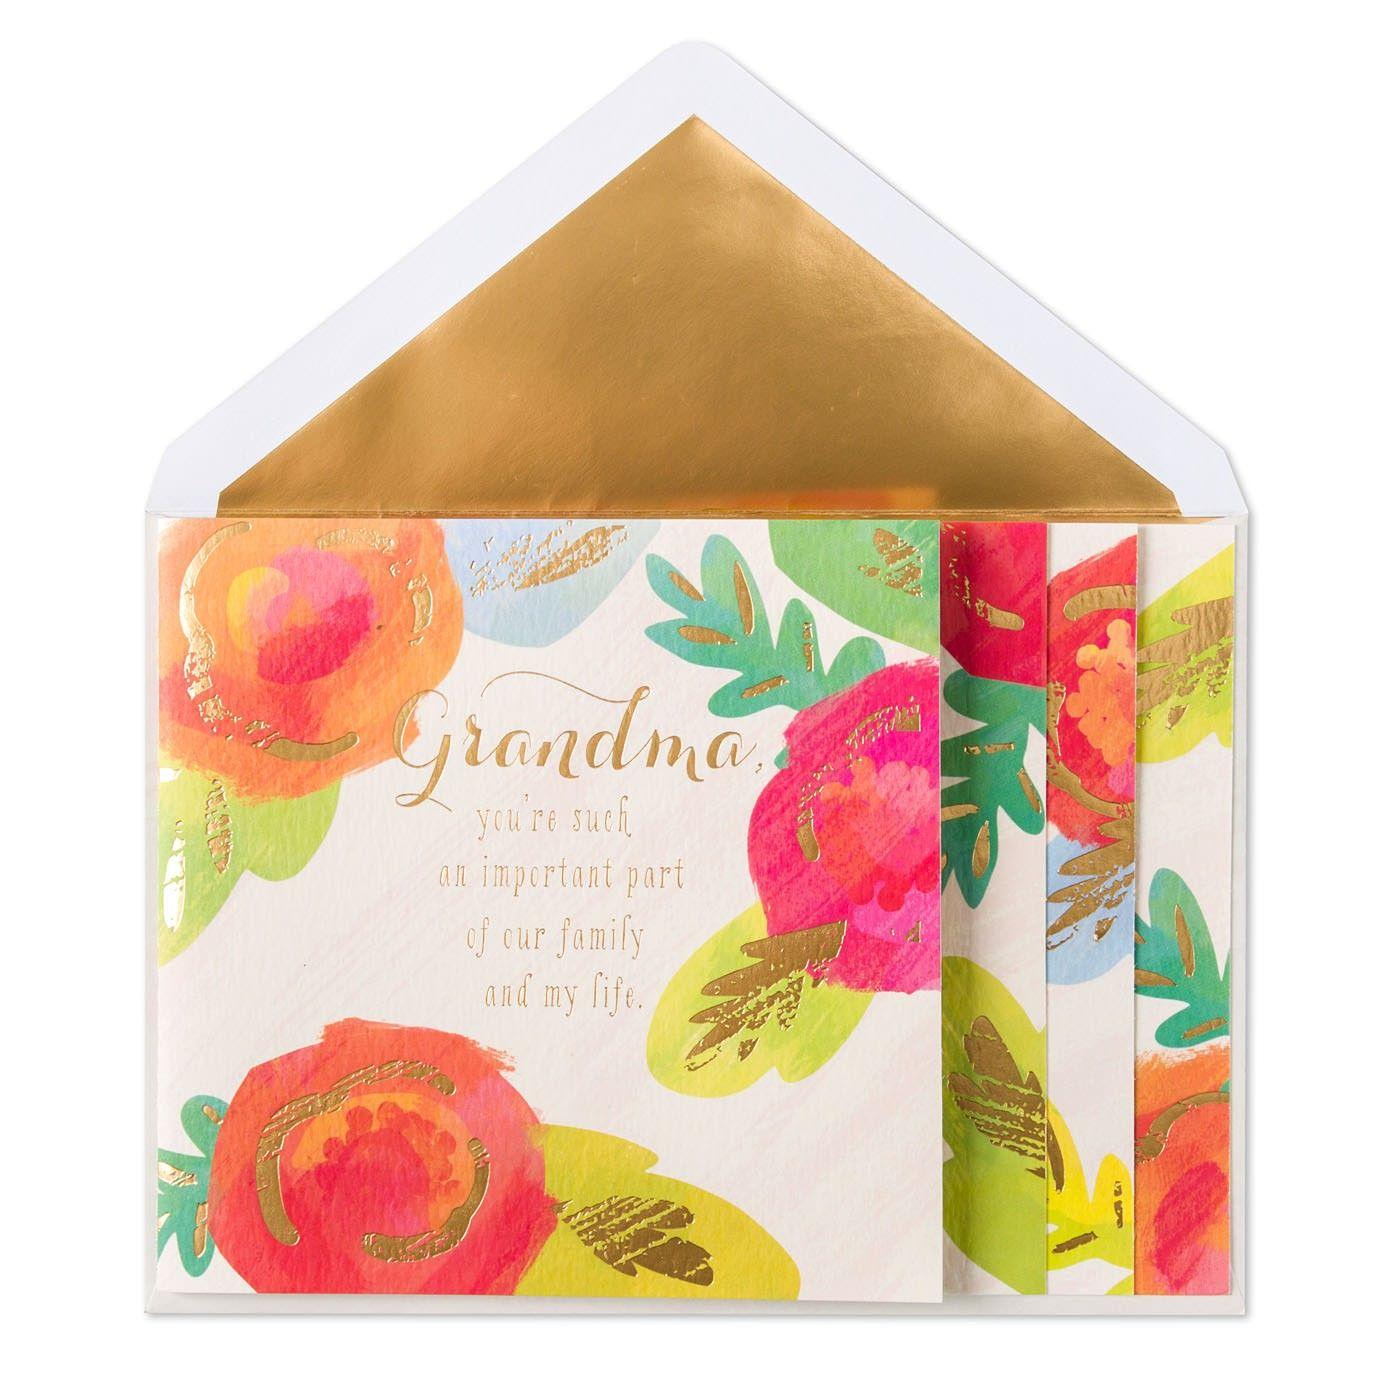 Important part birthday card for grandma card ideas pinterest